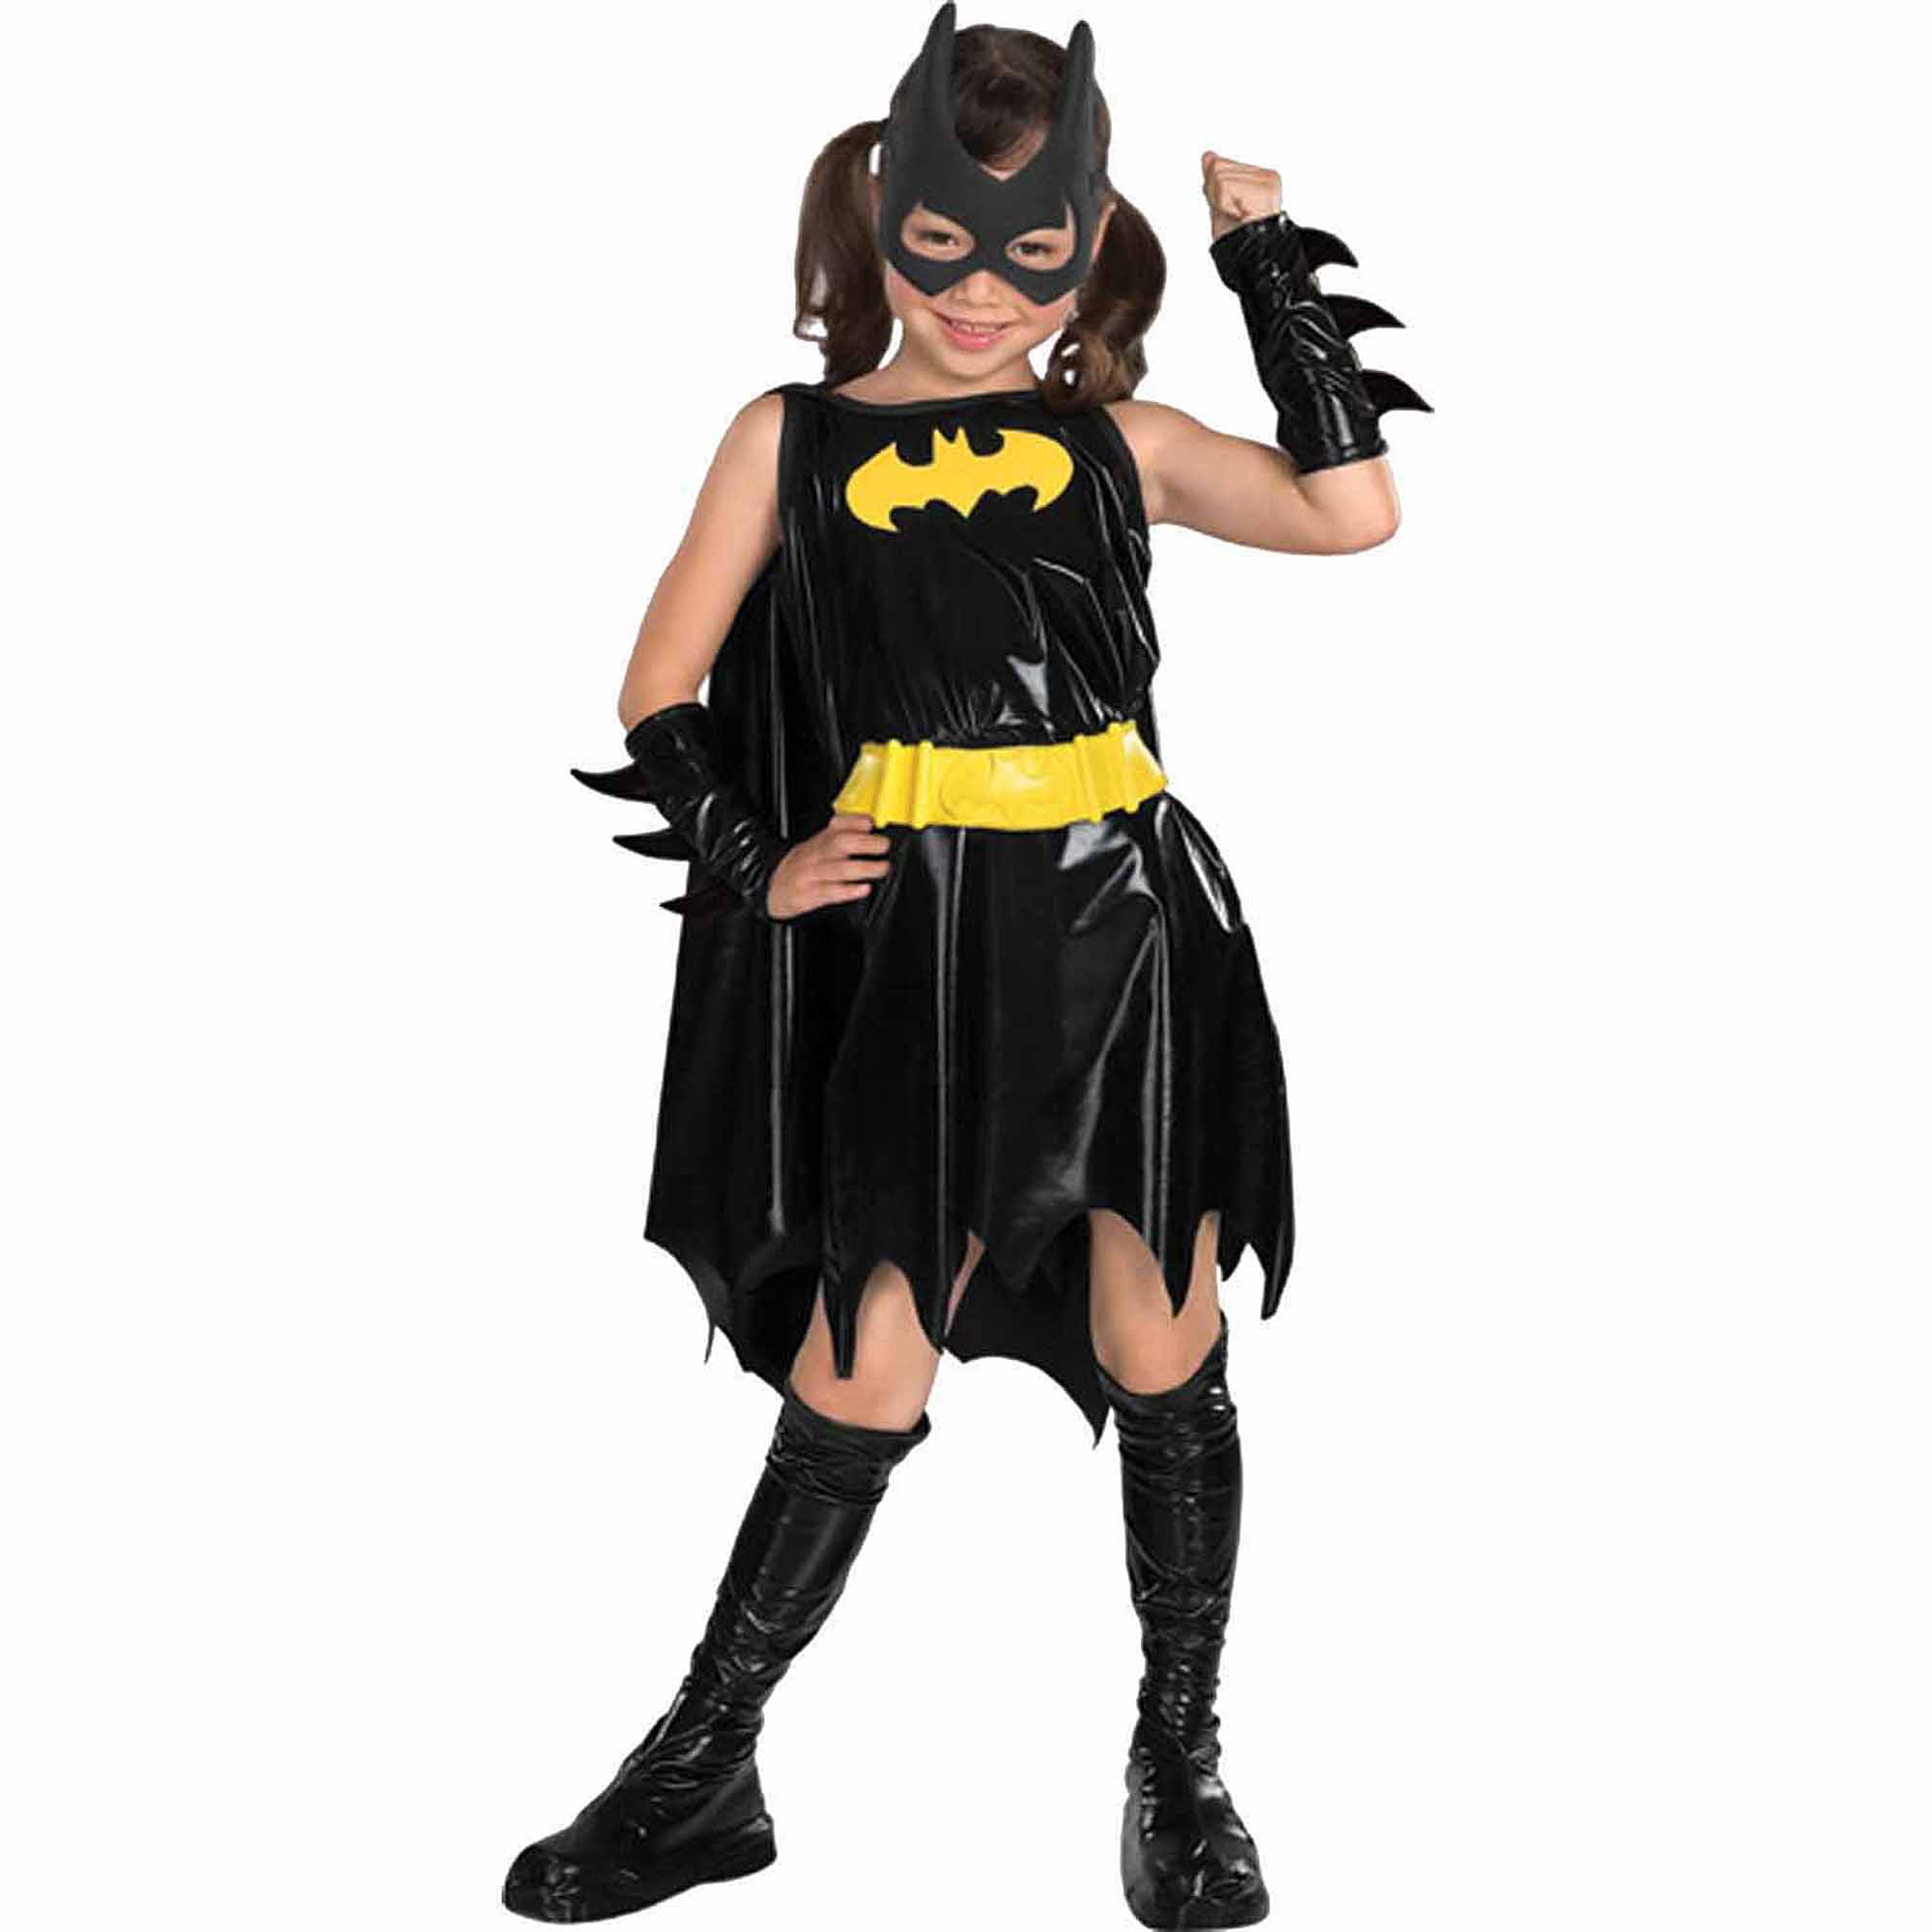 sc 1 st  Walmart & Girlsu0027 Batgirl Costume - Walmart.com